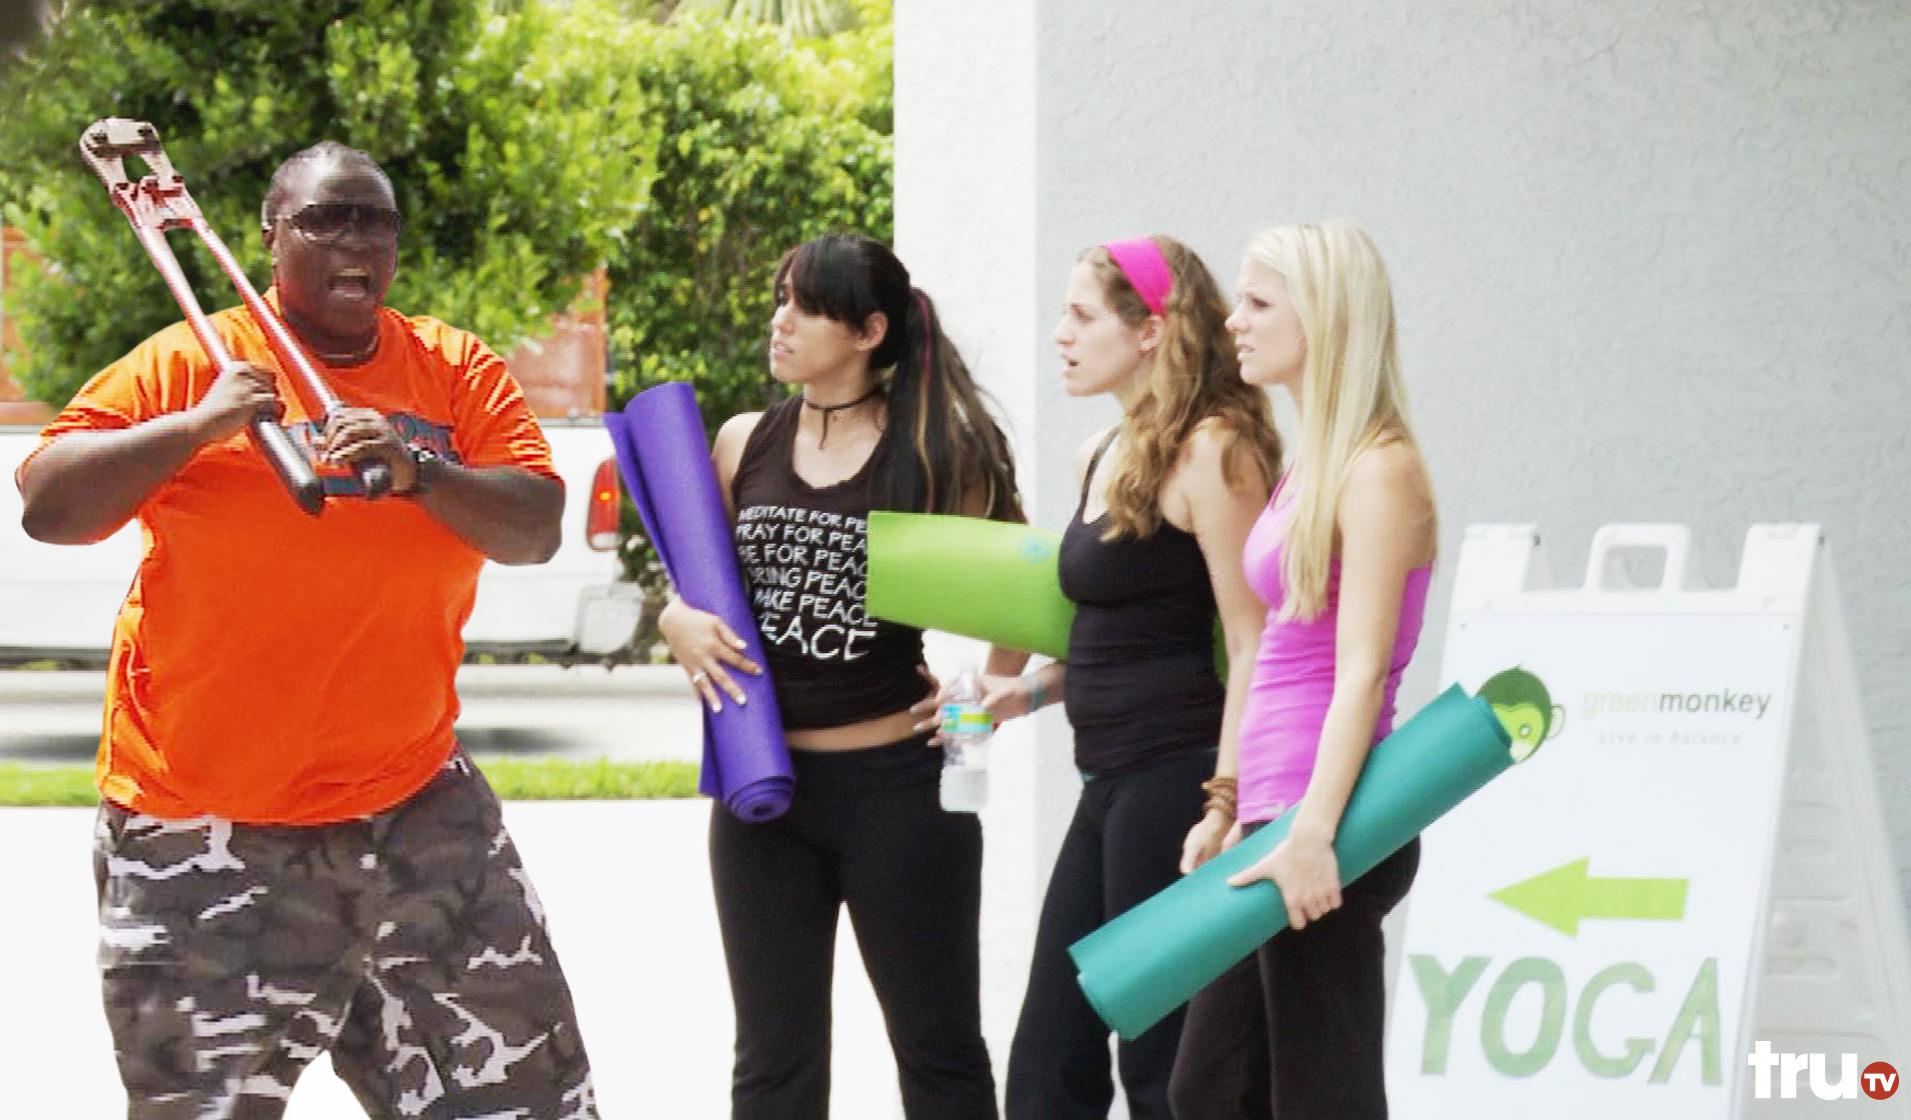 Yoga: The SOUTH BEACH TOW Way